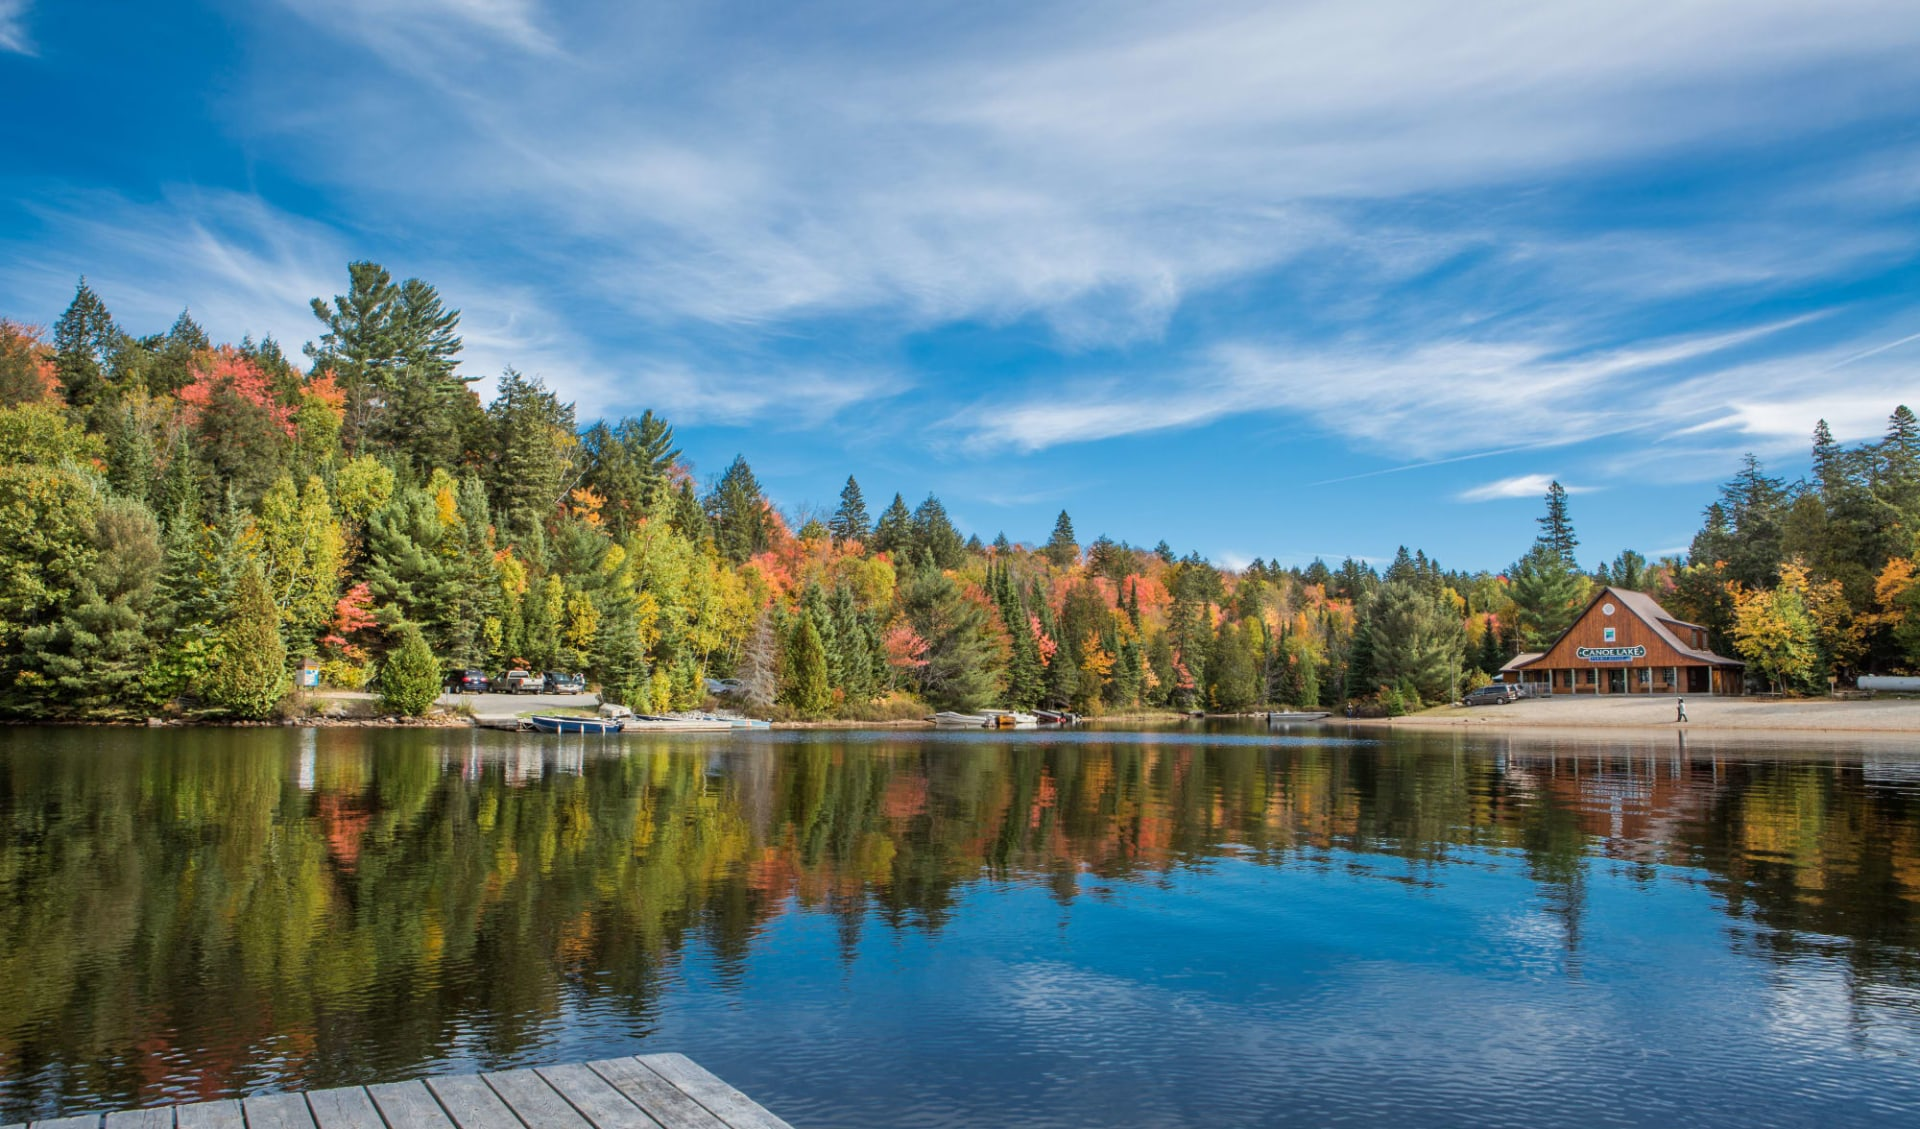 Ostkanada Highlights 9 Tage ab Toronto: Kanada - Algonquin Provincial Park - Aussicht auf See